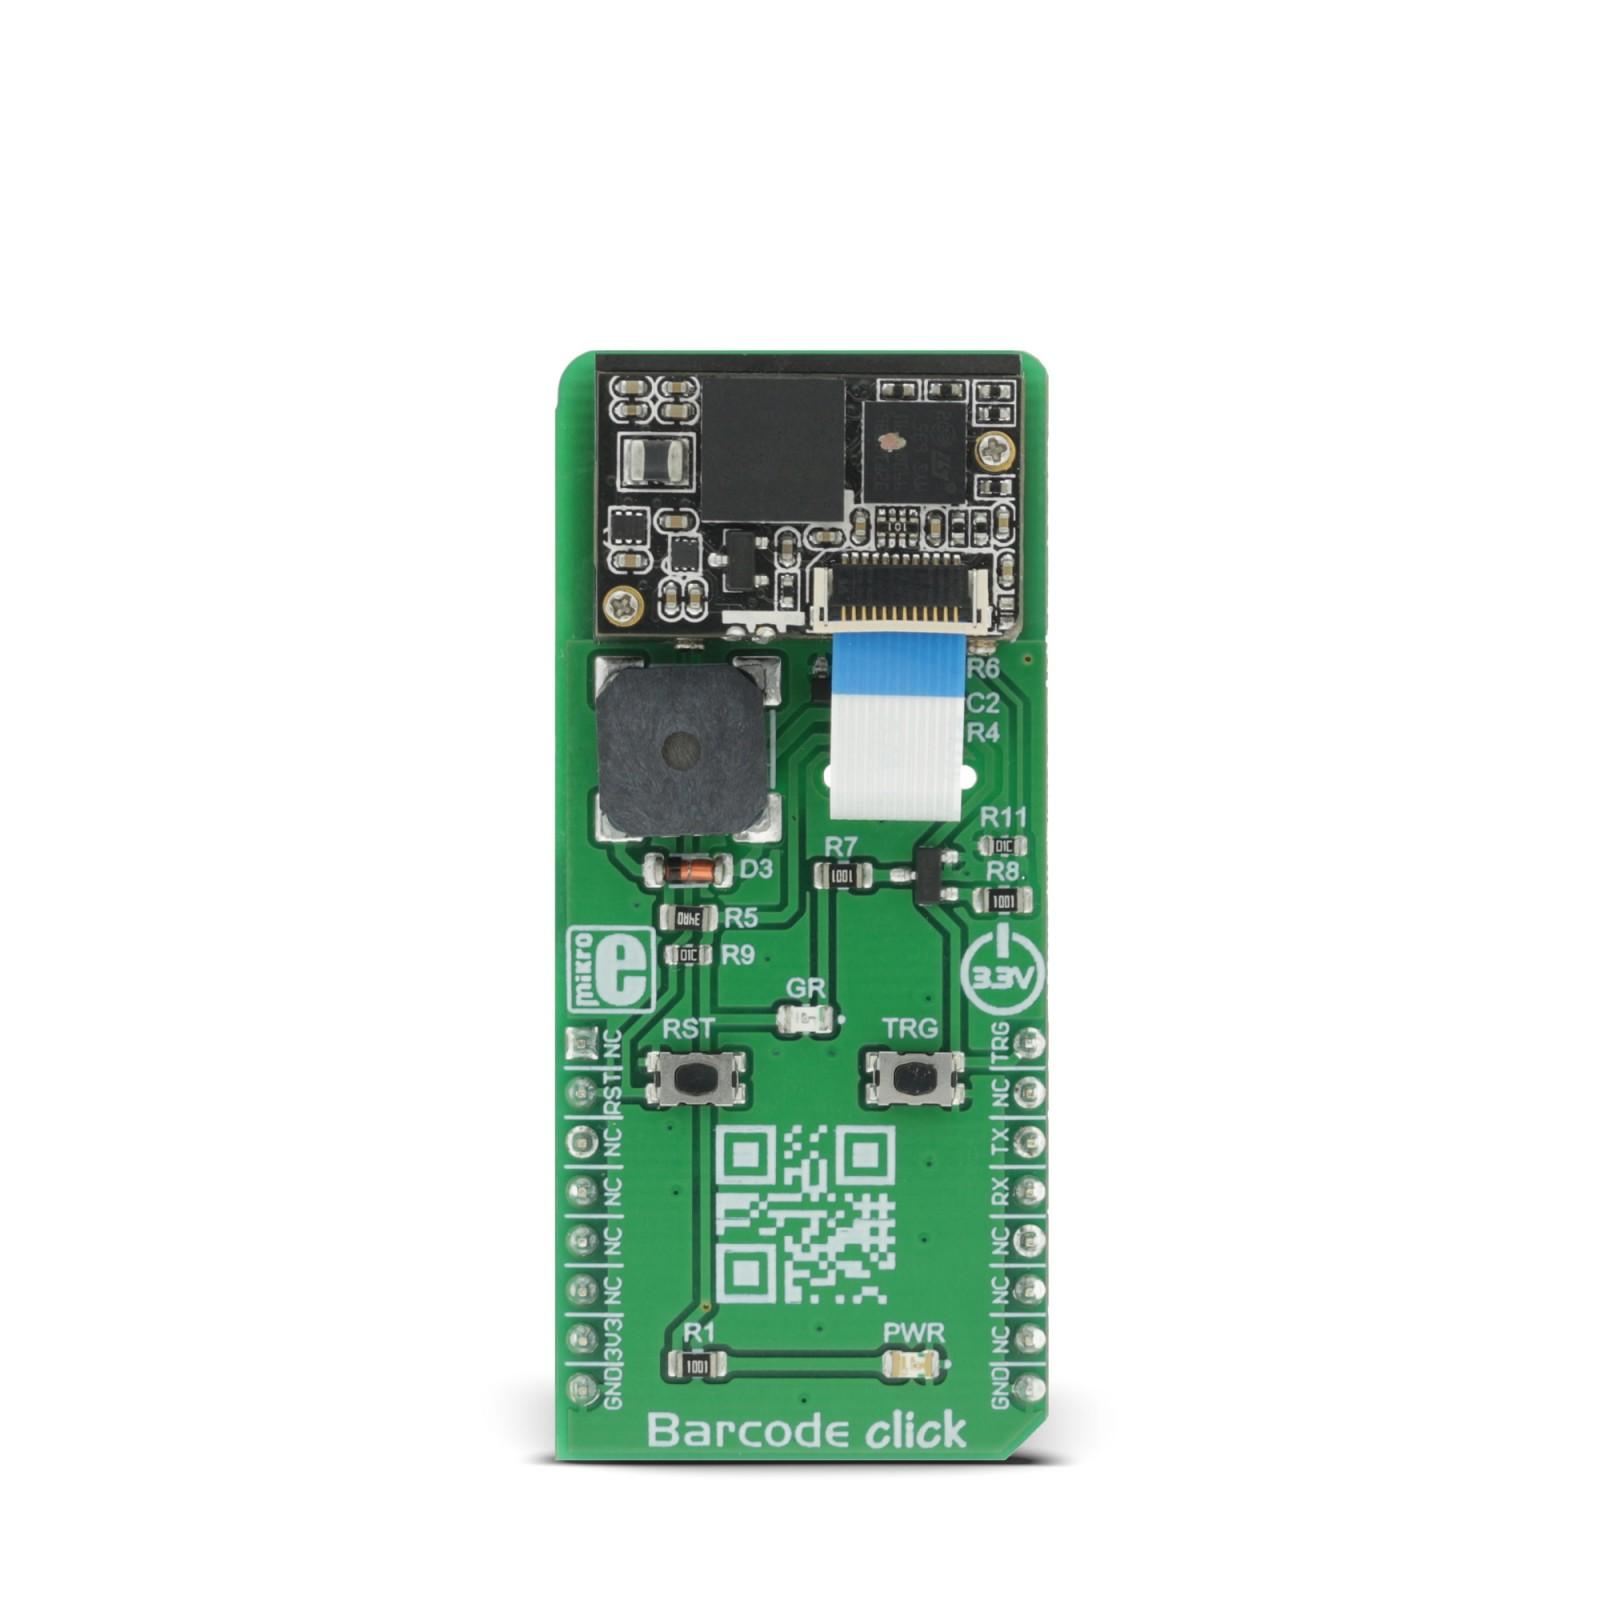 Barcode click | MikroElektronika